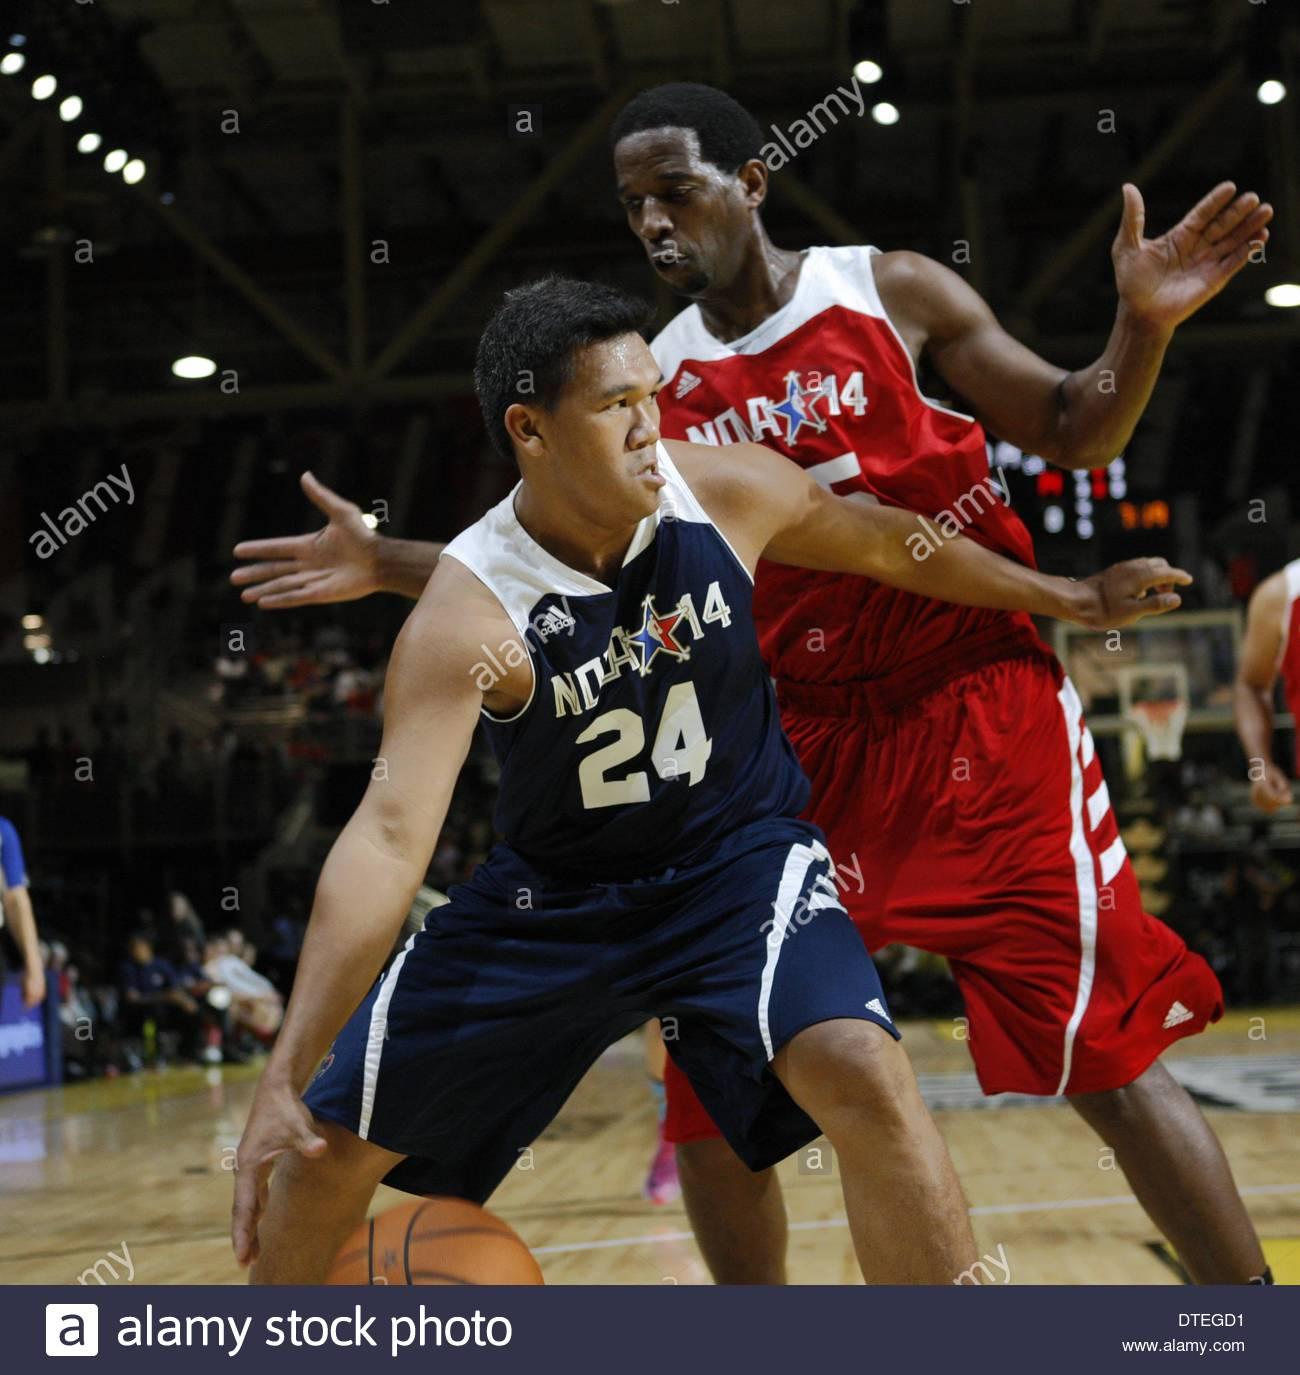 New Orleans, USA. 16. Februar 2014. Ehemaliger NBA-Spieler A.C. ...